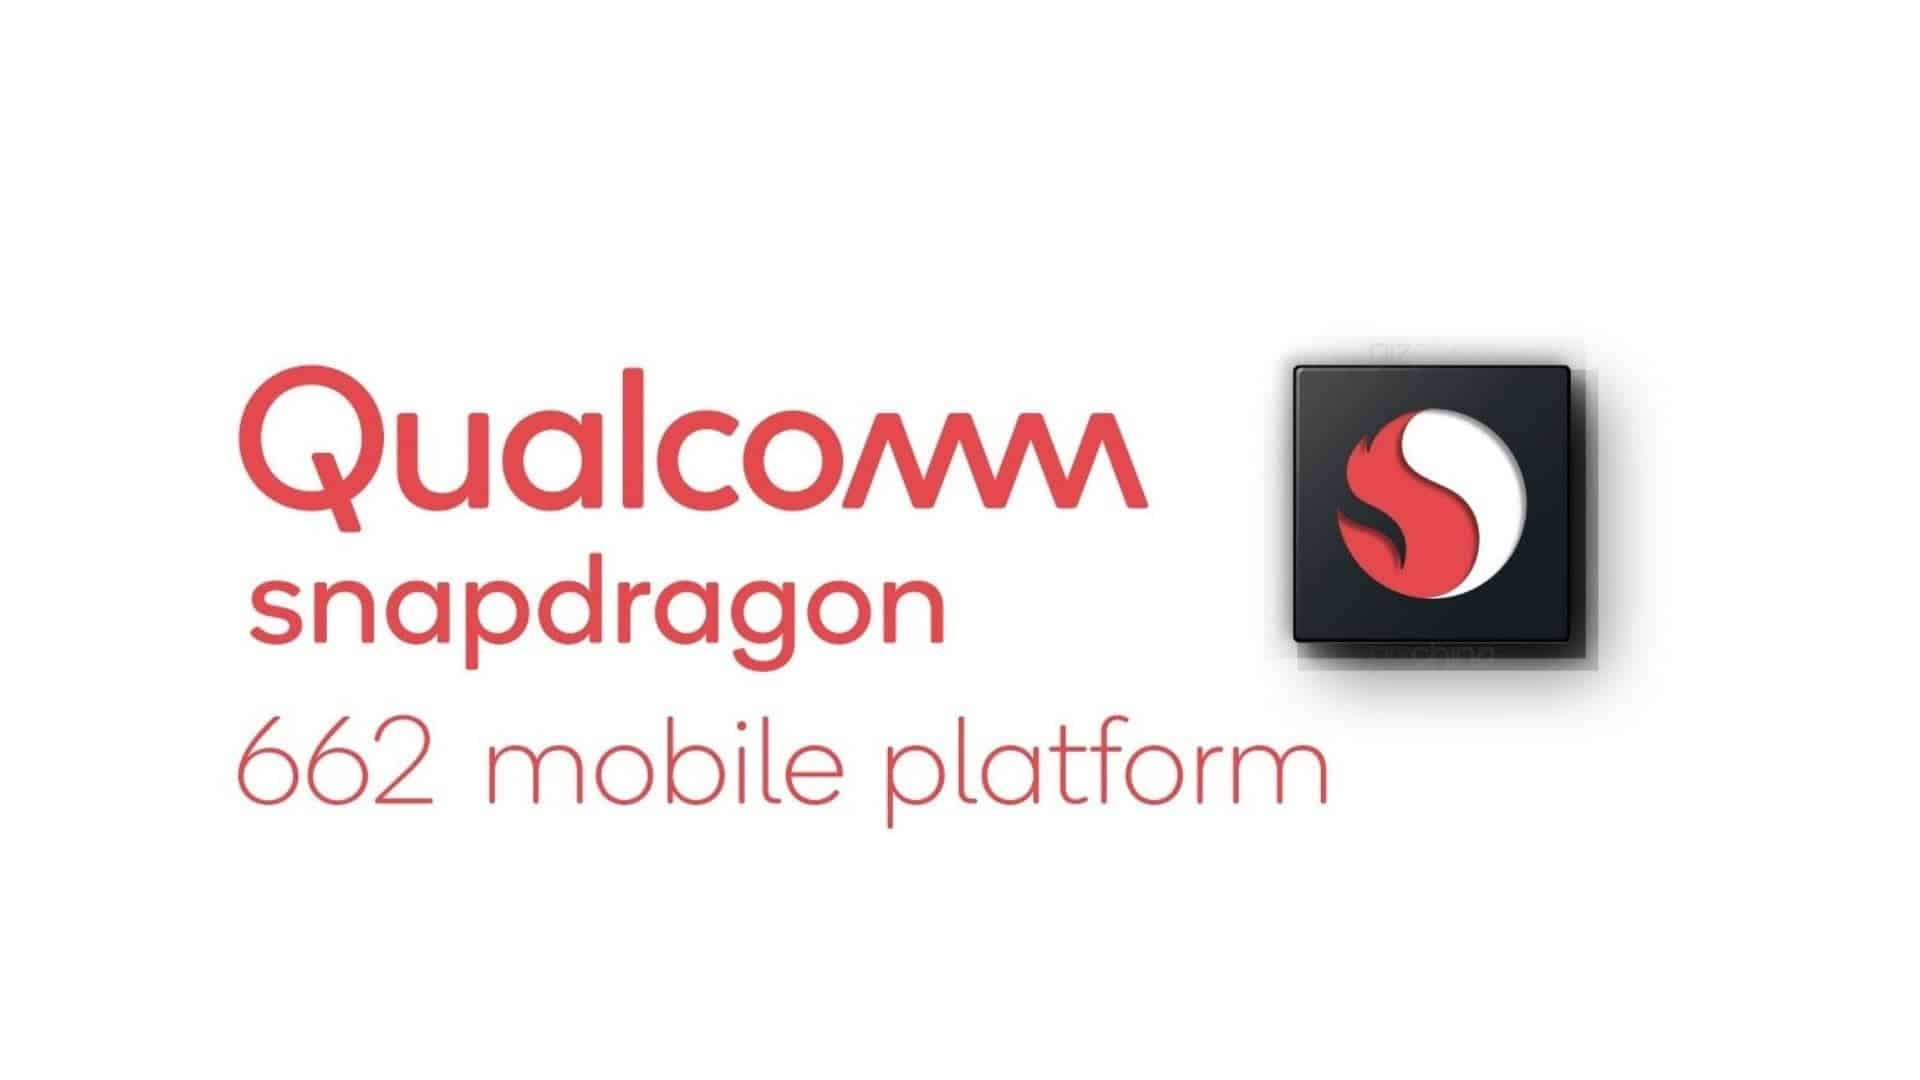 Qualcomm Snapdragon 662 Snapdragon 460